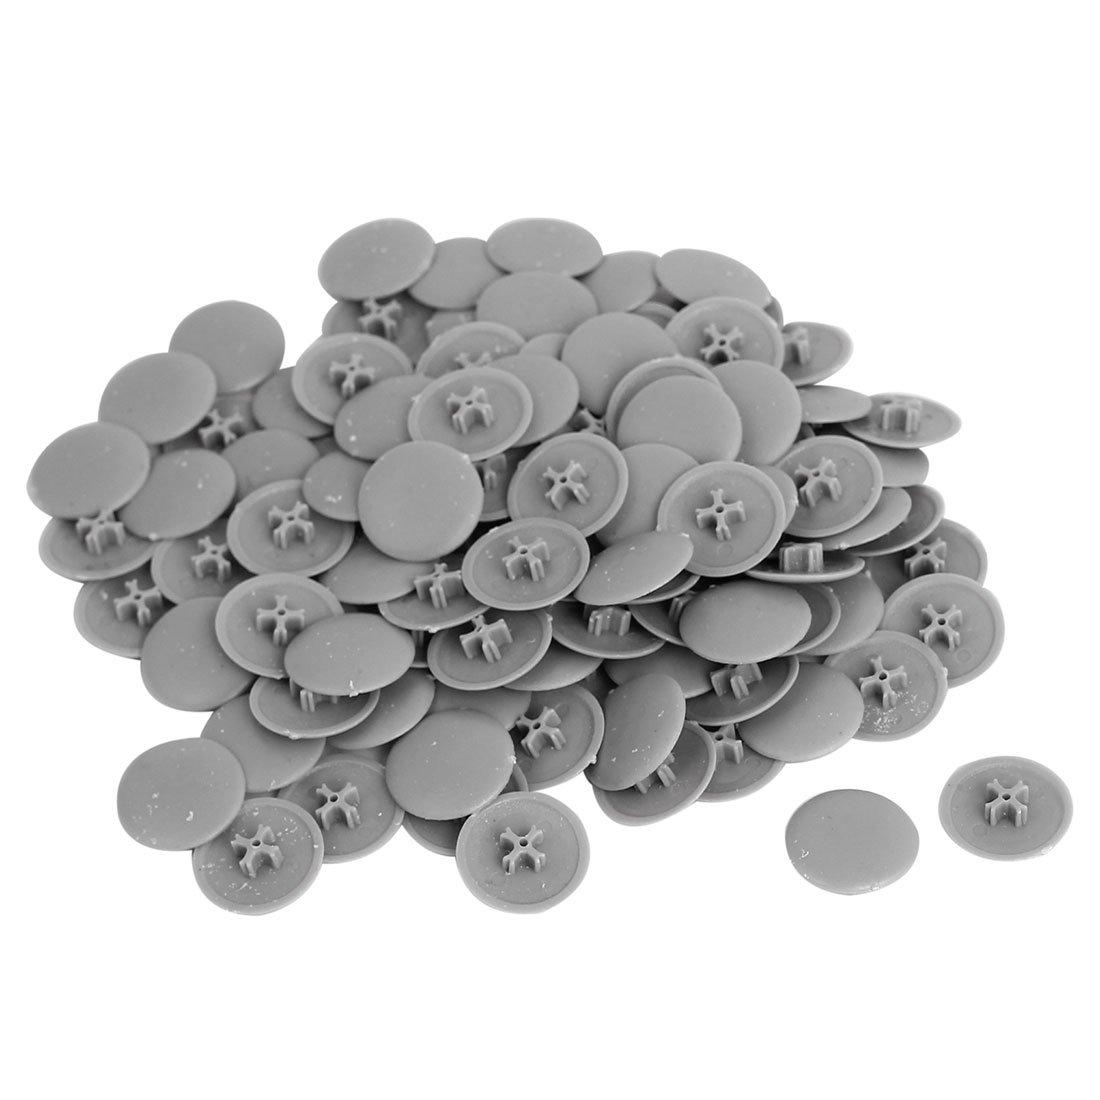 Phillips Screws Plastic Decoration Cap Cover 17mm x 6.5mm 100pcs Gray uxcell a15072800ux0723